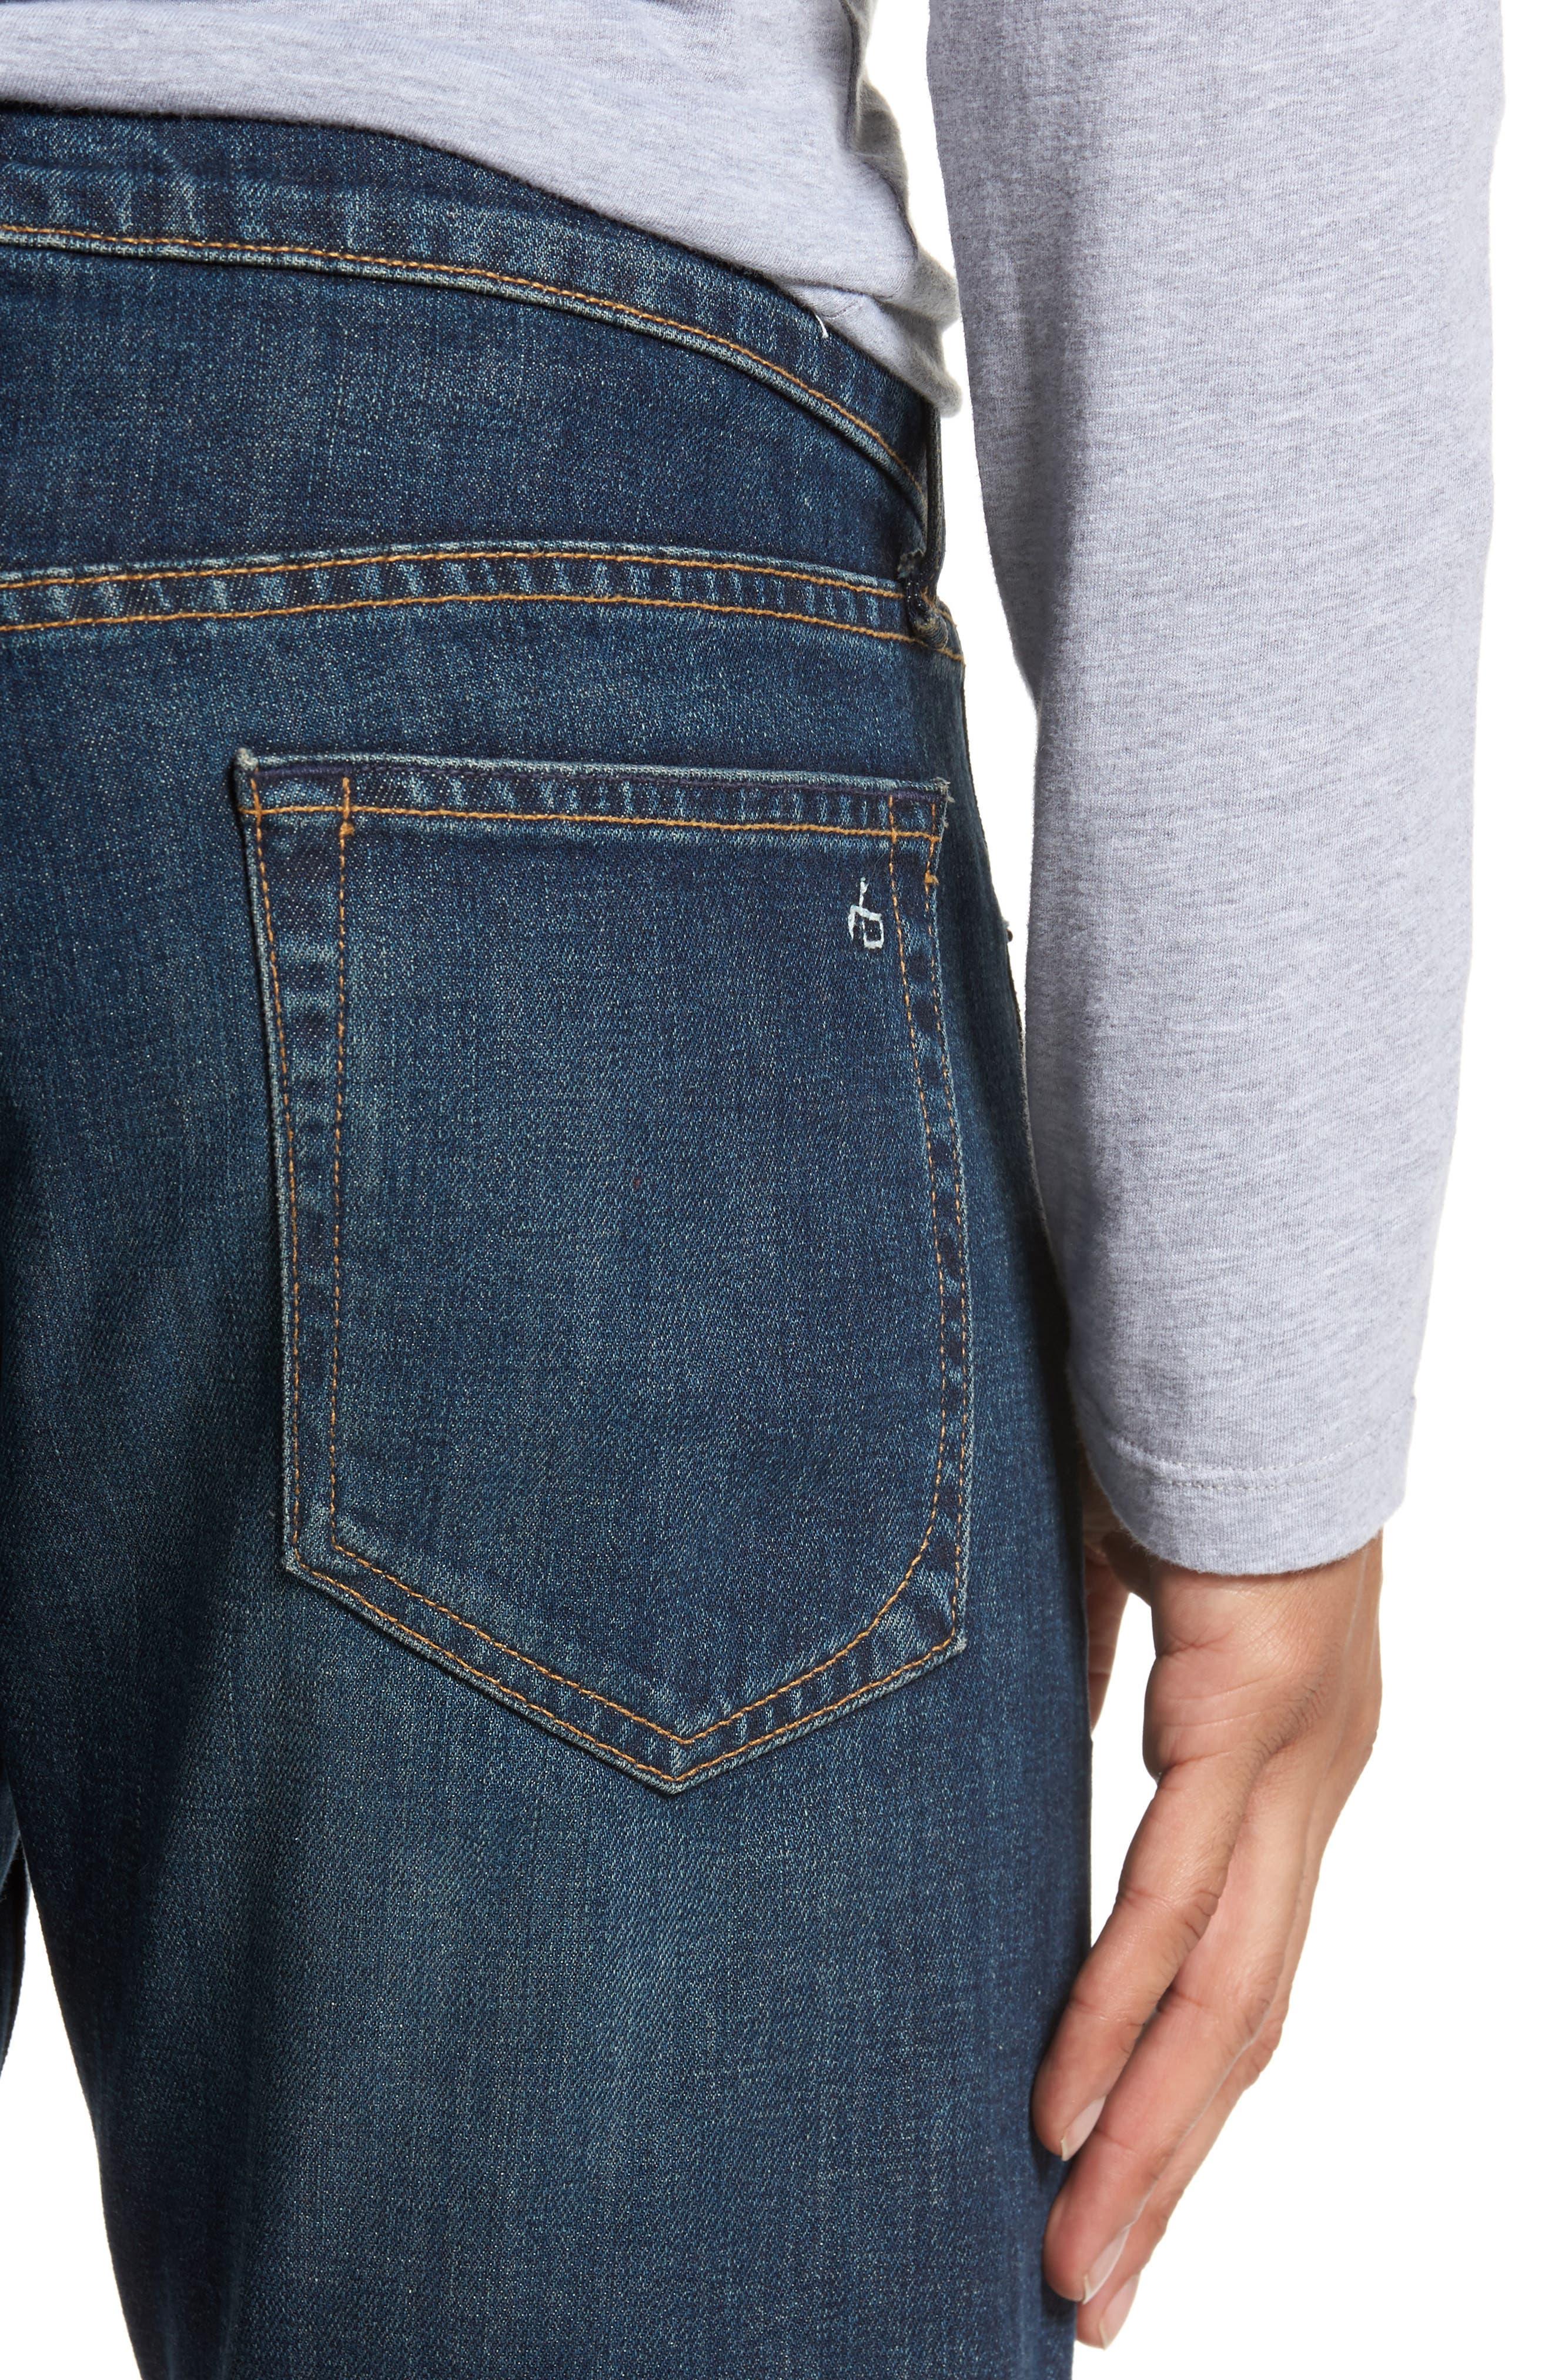 Fit 1 Skinny Fit Jeans,                             Alternate thumbnail 4, color,                             Linden